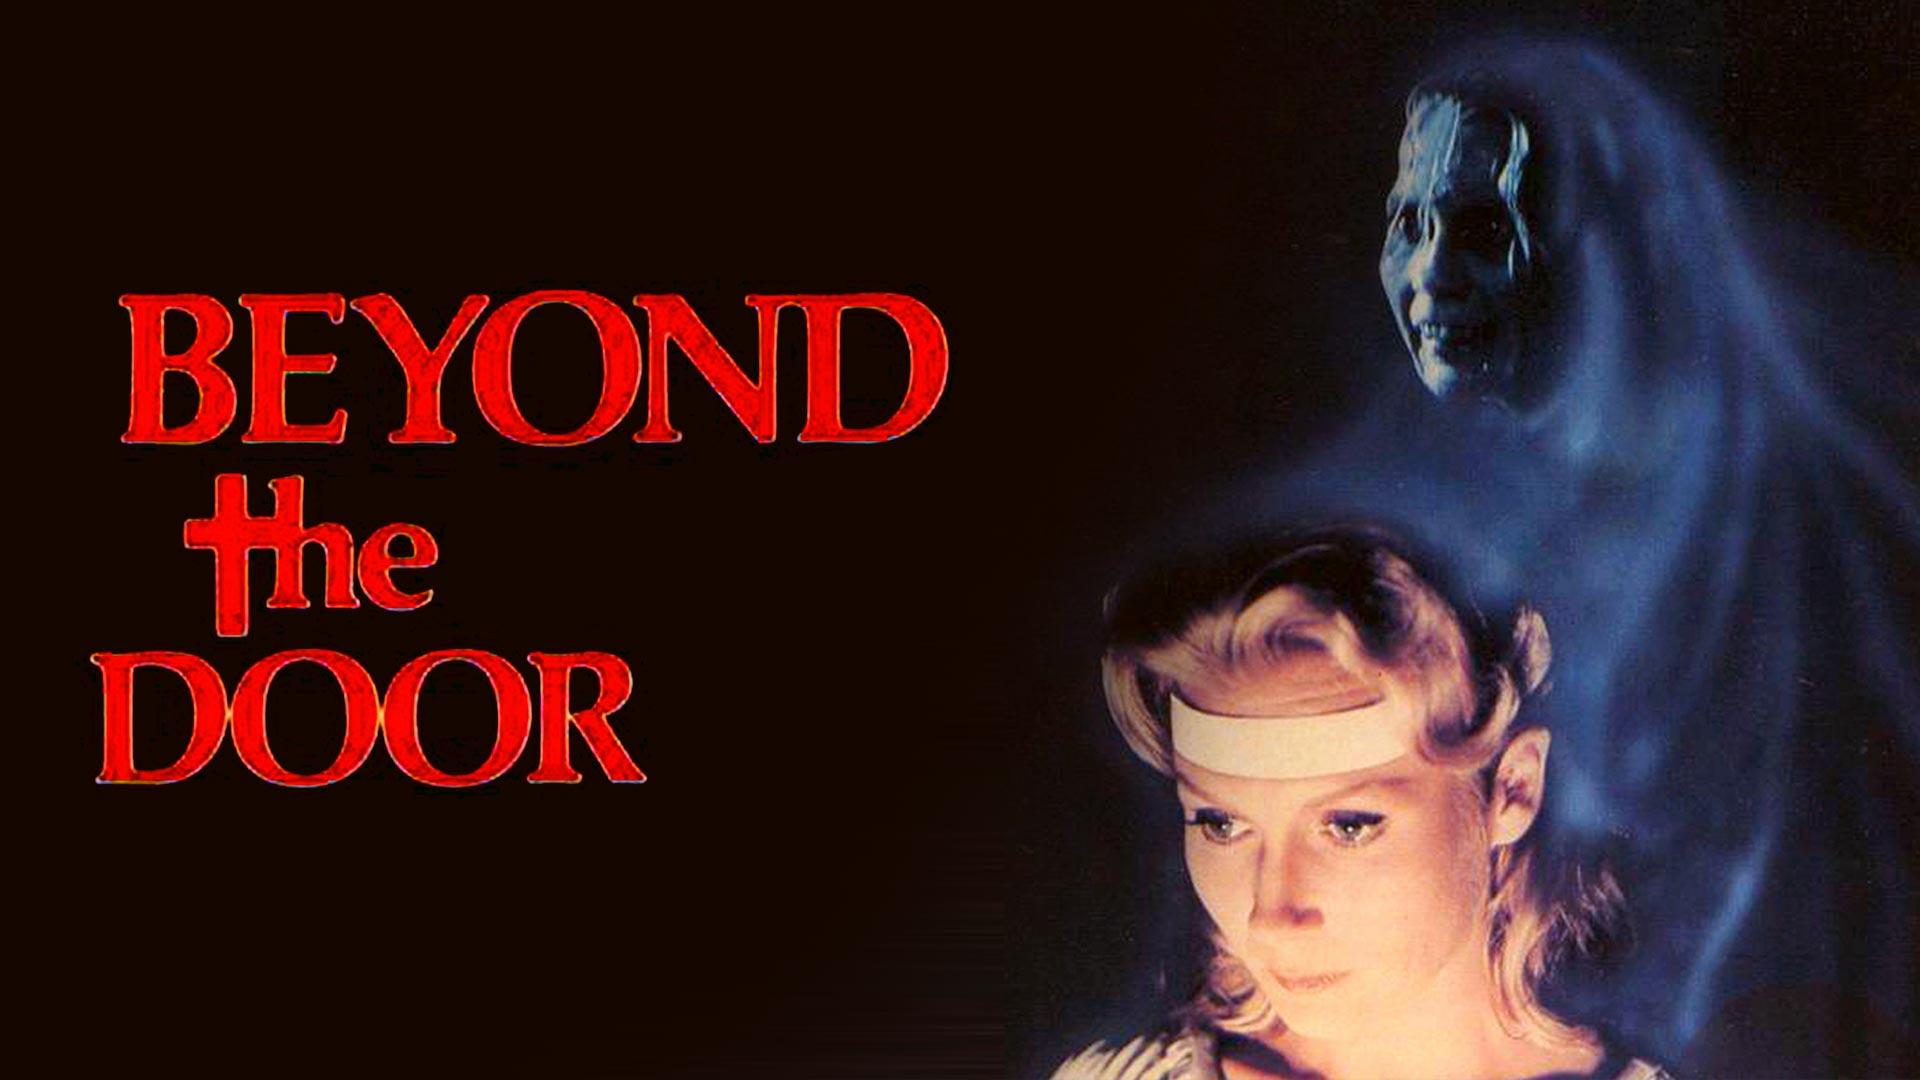 Beyond The Door (Chi Sei?) [VHS Retro Style] 1974